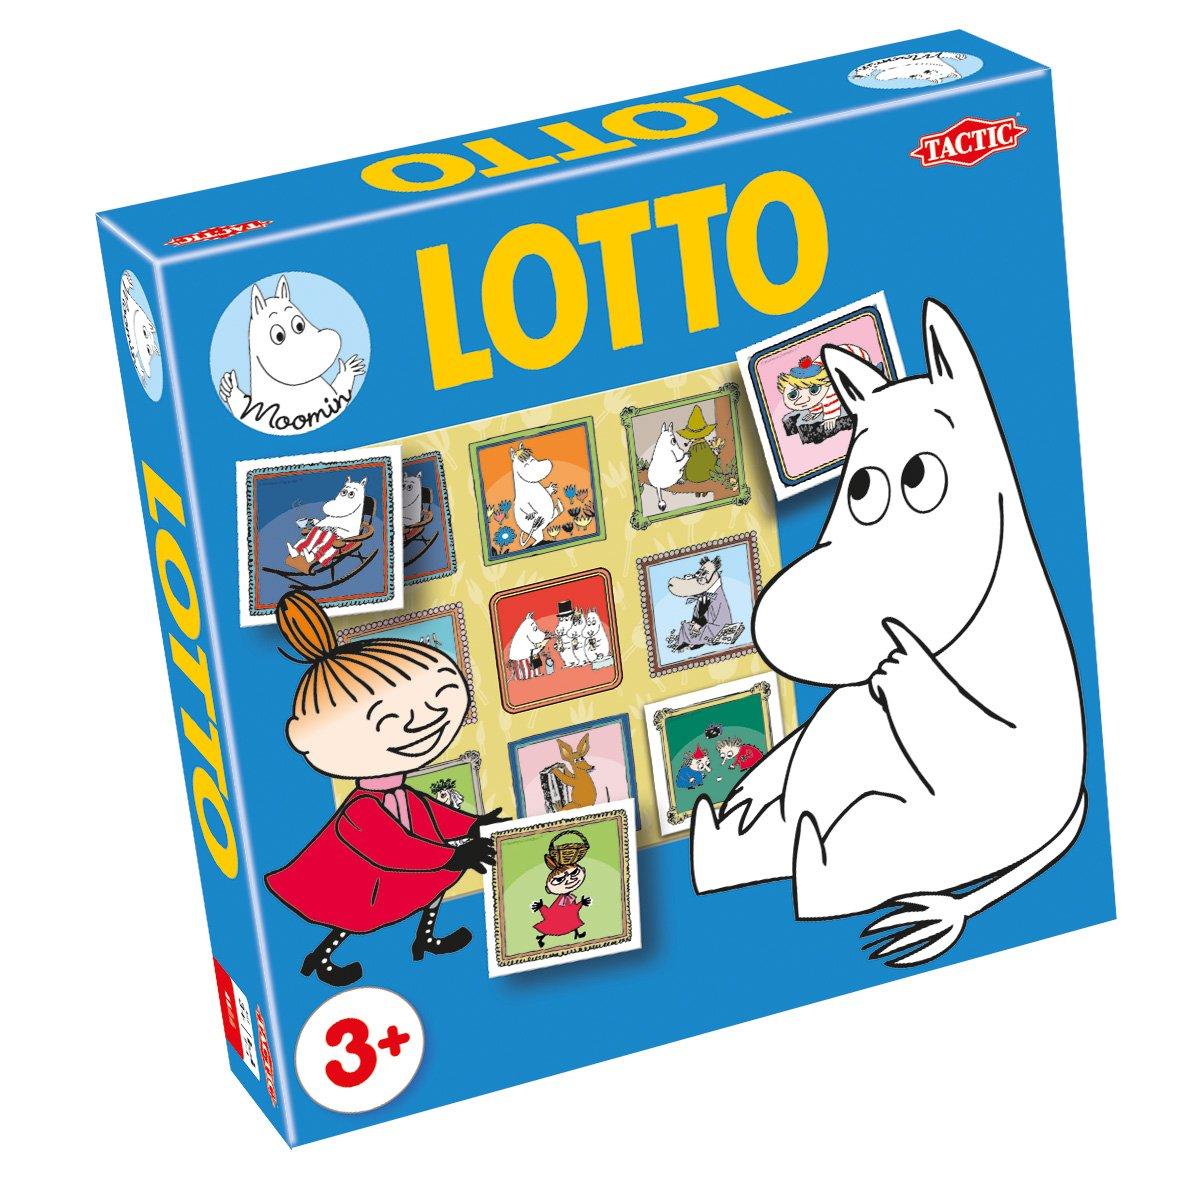 Tactic Moomin Lotto Juego